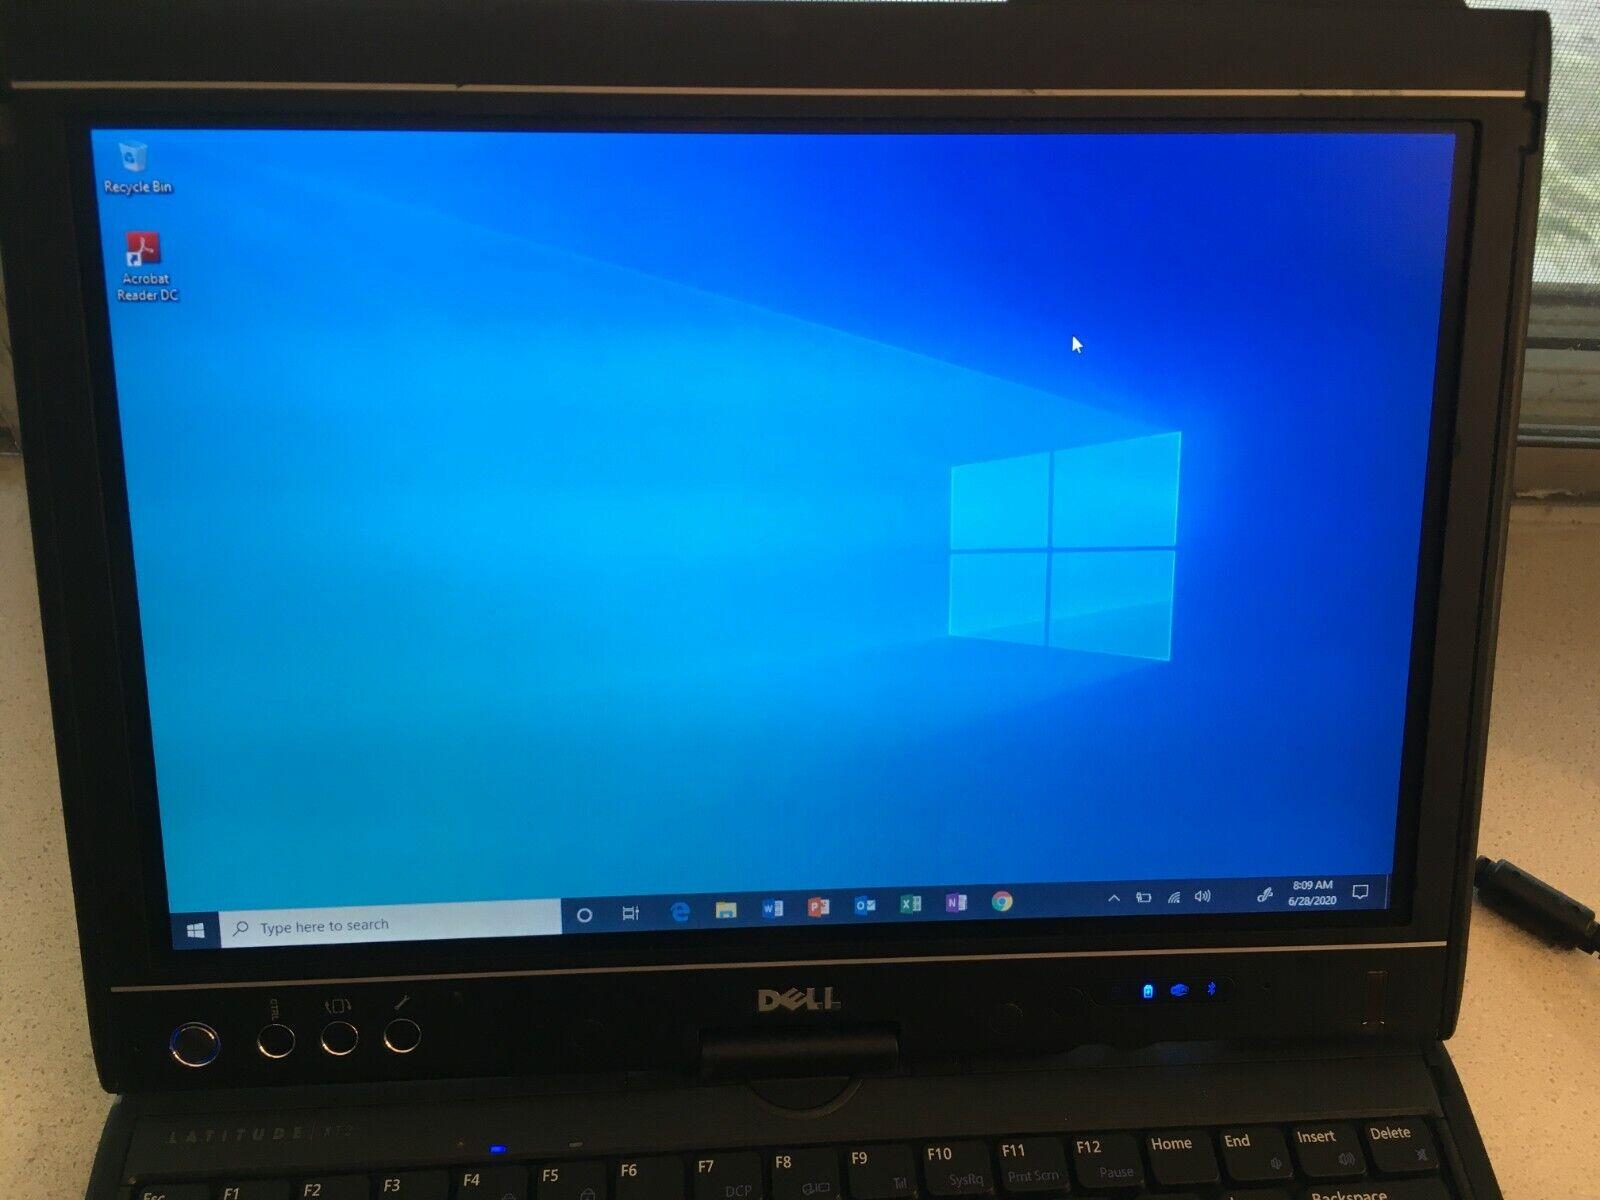 Laptop Windows - Dell Latitude XT2 Tablet Windows 10 Pro, 5GB Ram, 256GB SSD, MS Office